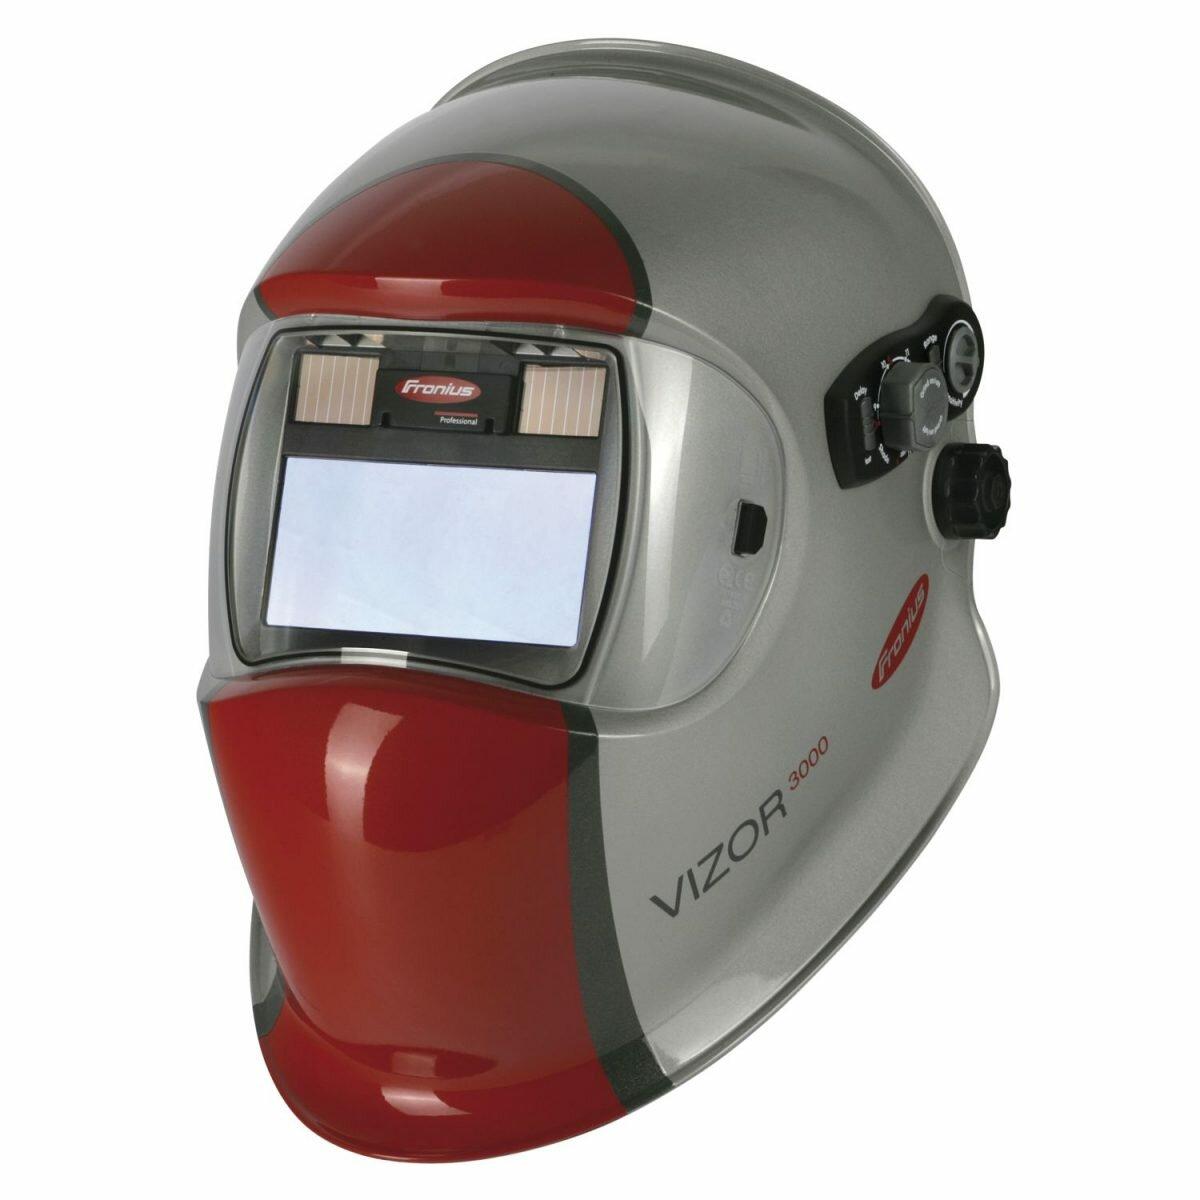 Fronius Vizor 3000 Standard